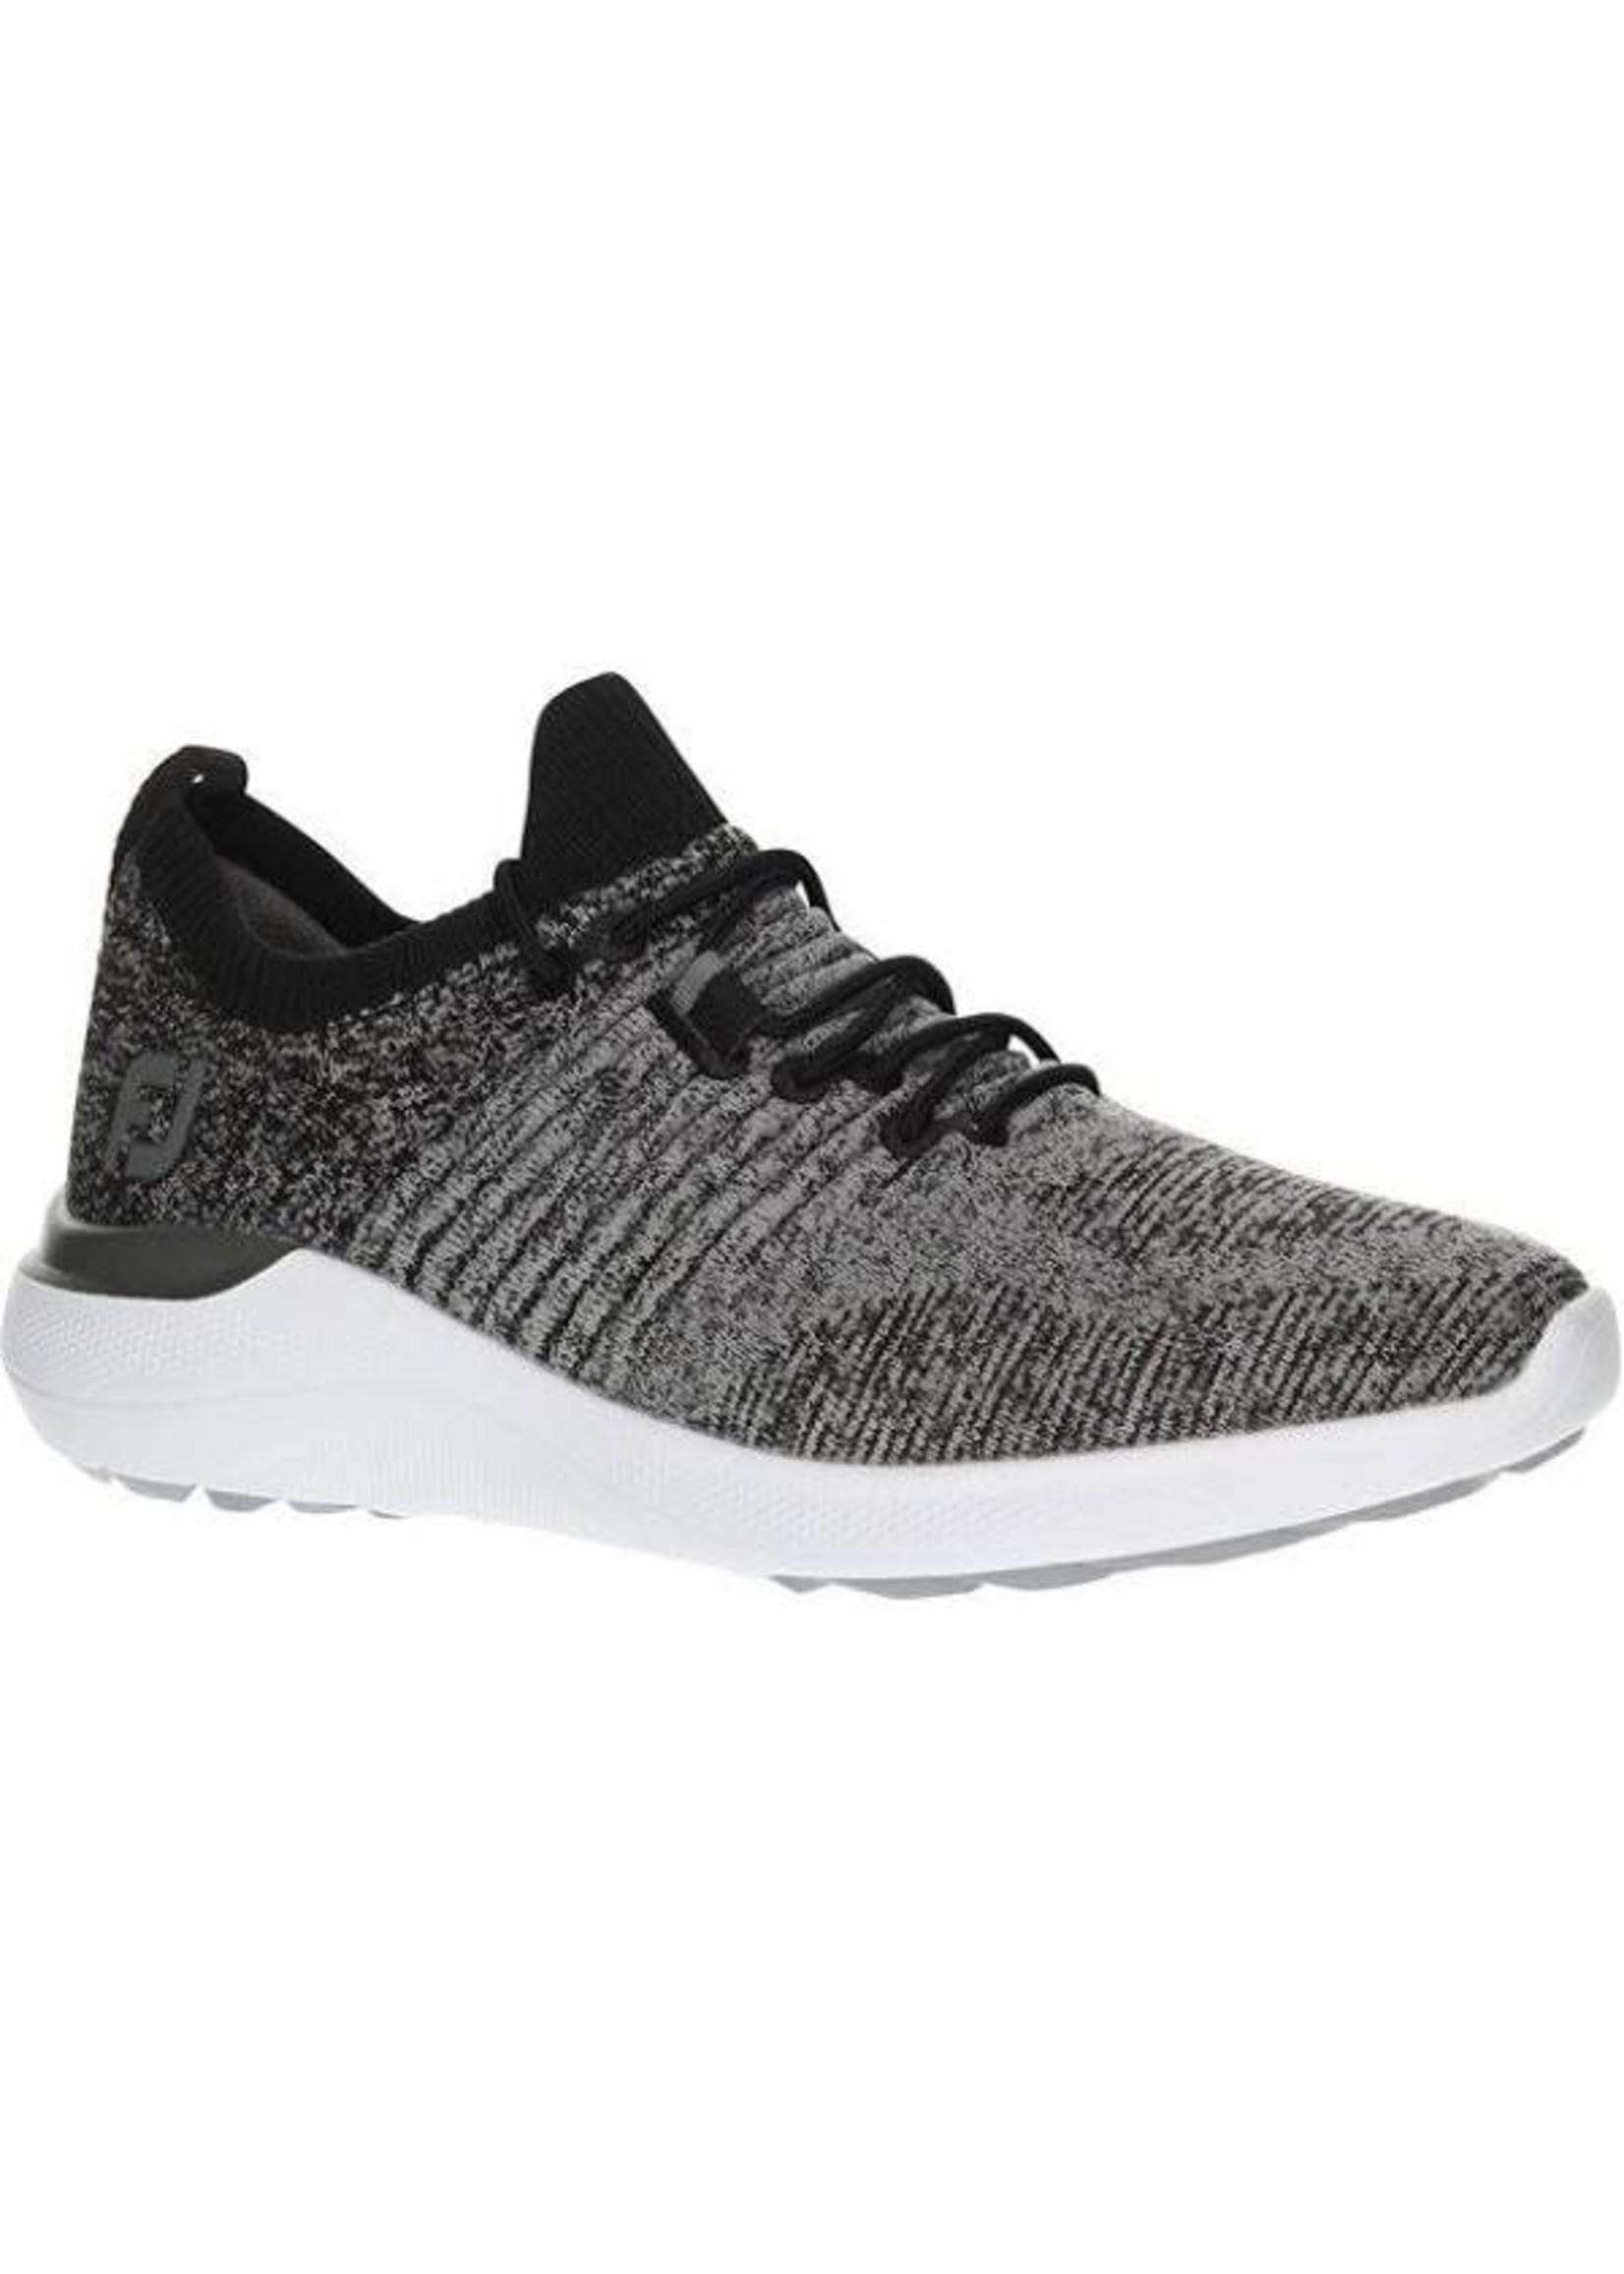 Footjoy Footjoy Flex XP Lades Golf Shoe, Grey